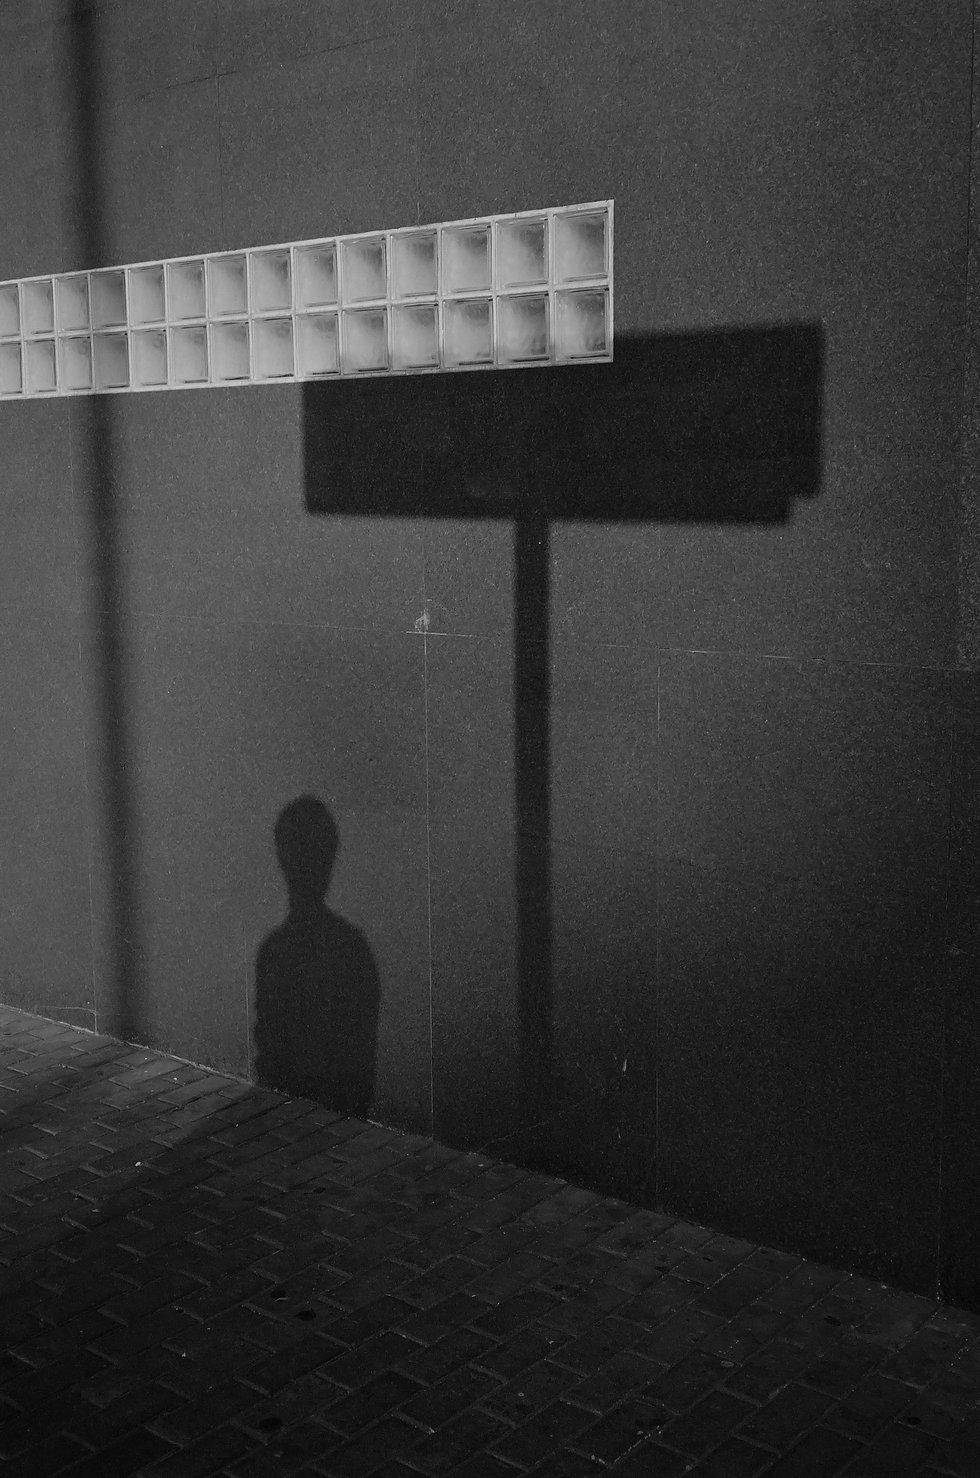 Shadow of a boy figure over a black wall